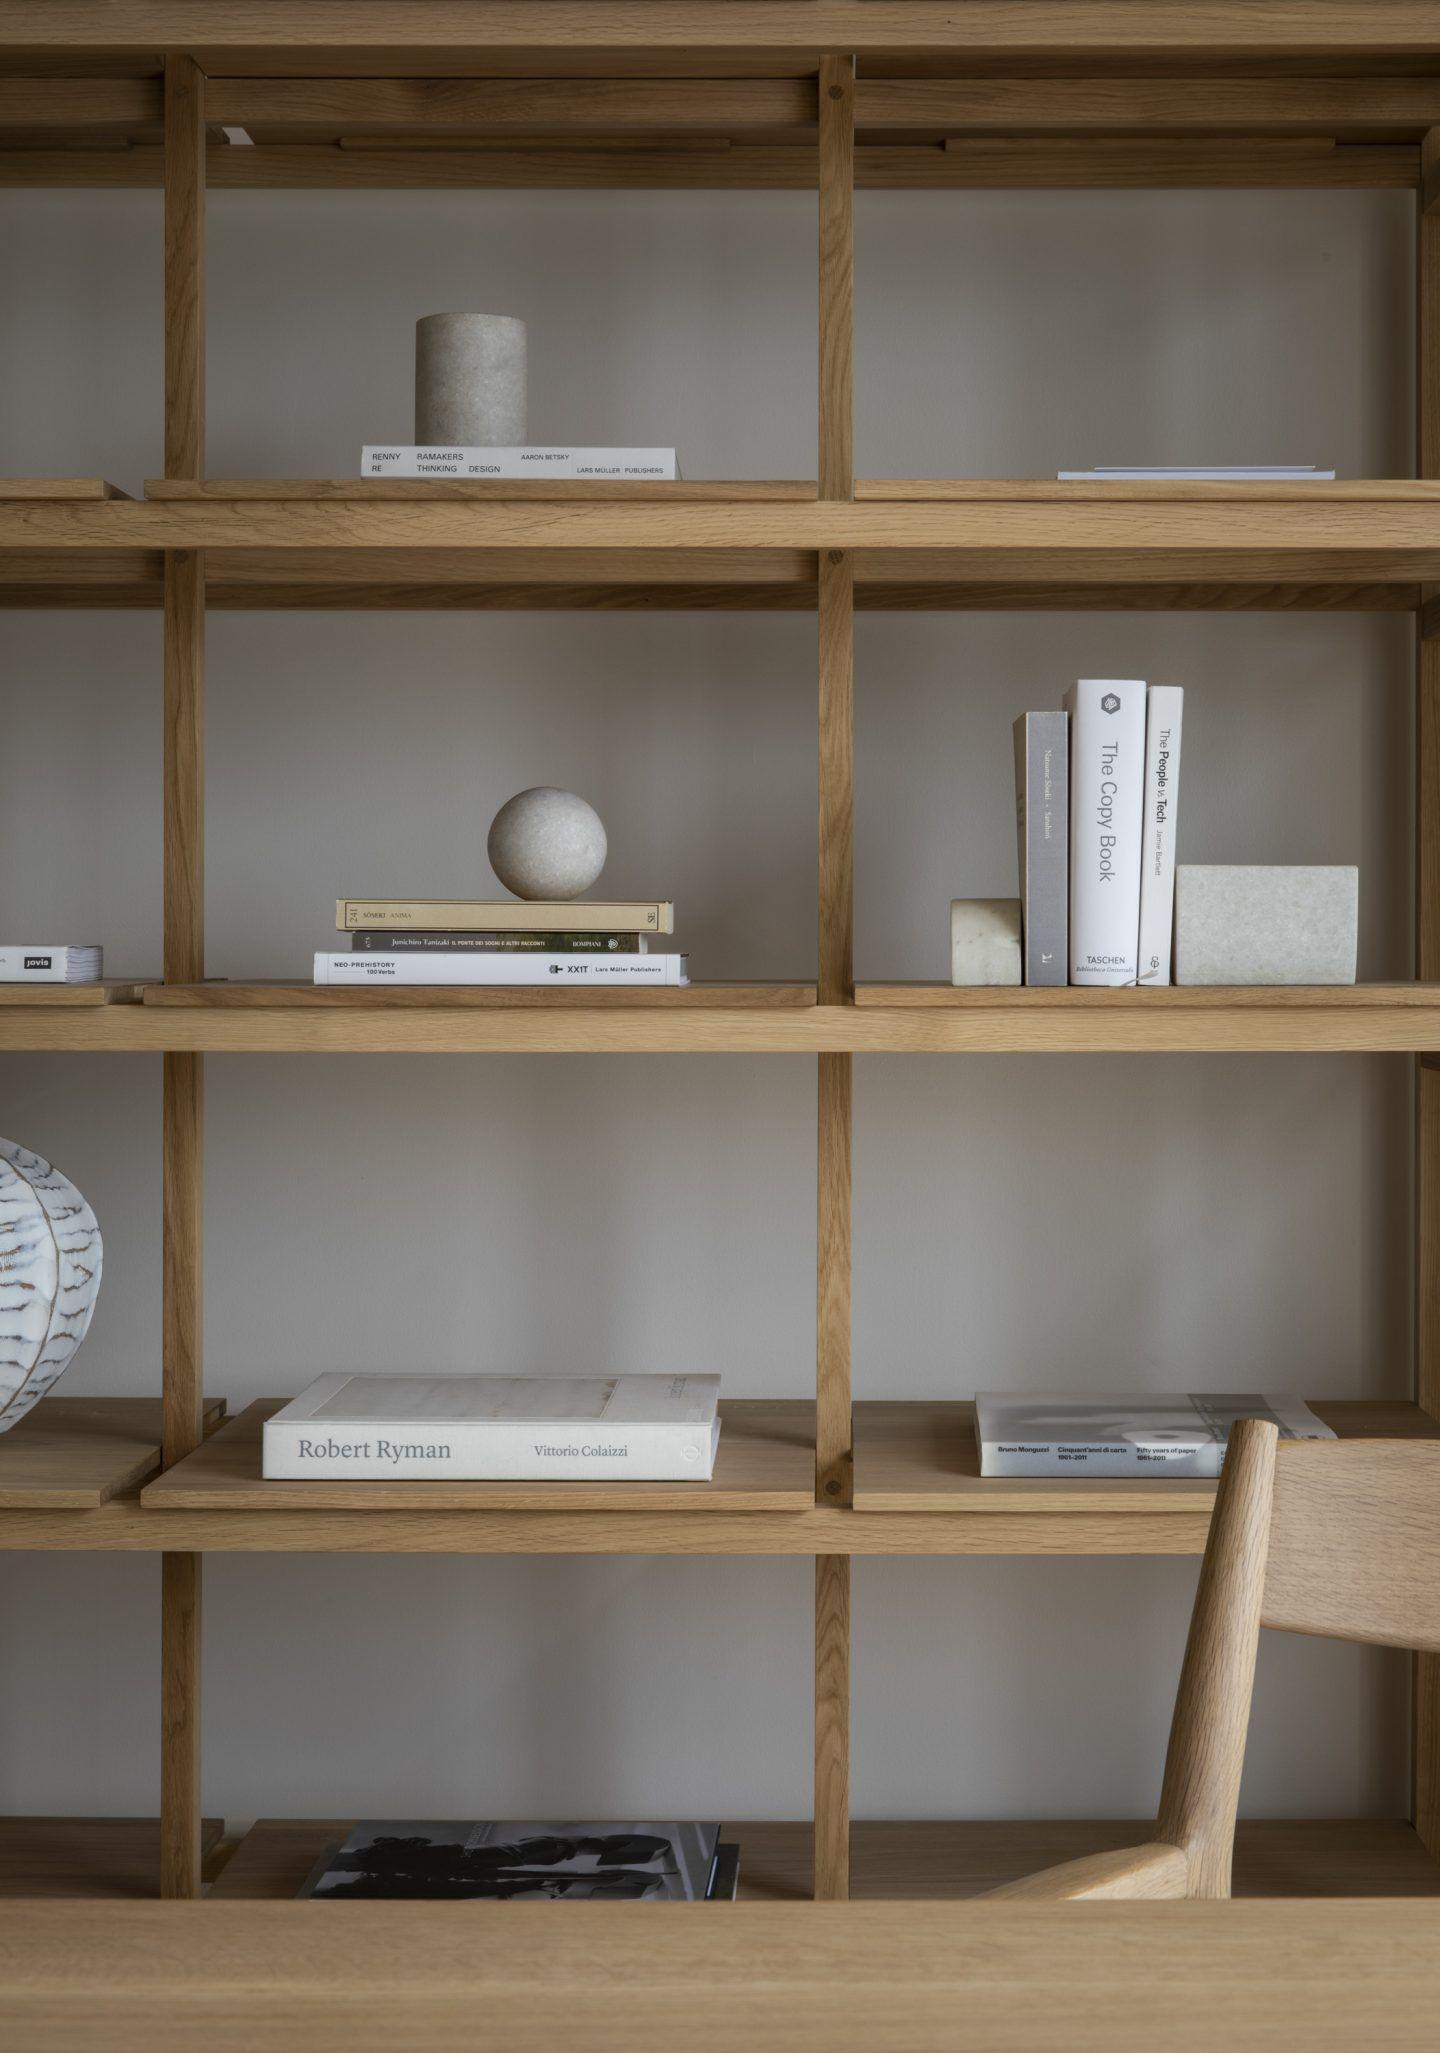 IGNANT-Design-Norm-Architects-Kinuta-Terrace-015